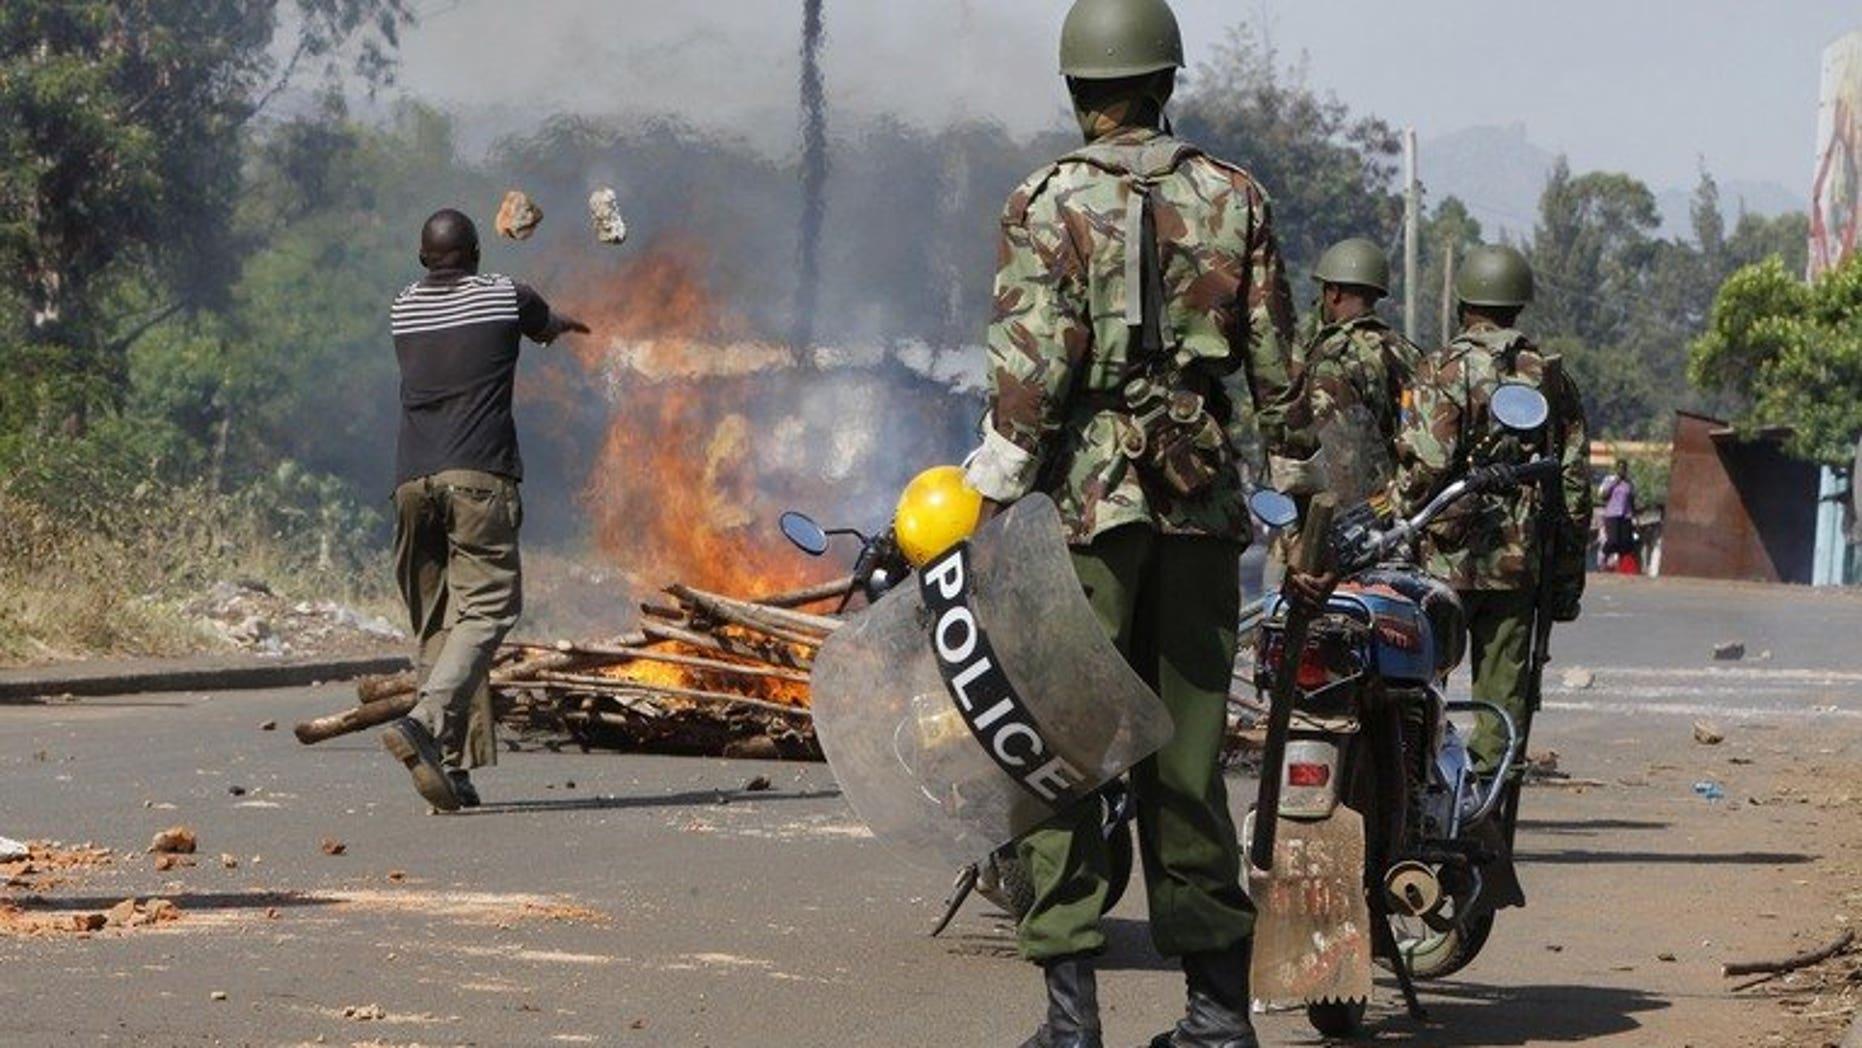 Kenyan police officers are deployed in Kisumu slum on March 9, 2013. Nine people were killed on Friday night in fresh inter-clan violence in northeastern Kenya's border region with war-torn Somalia, police said.